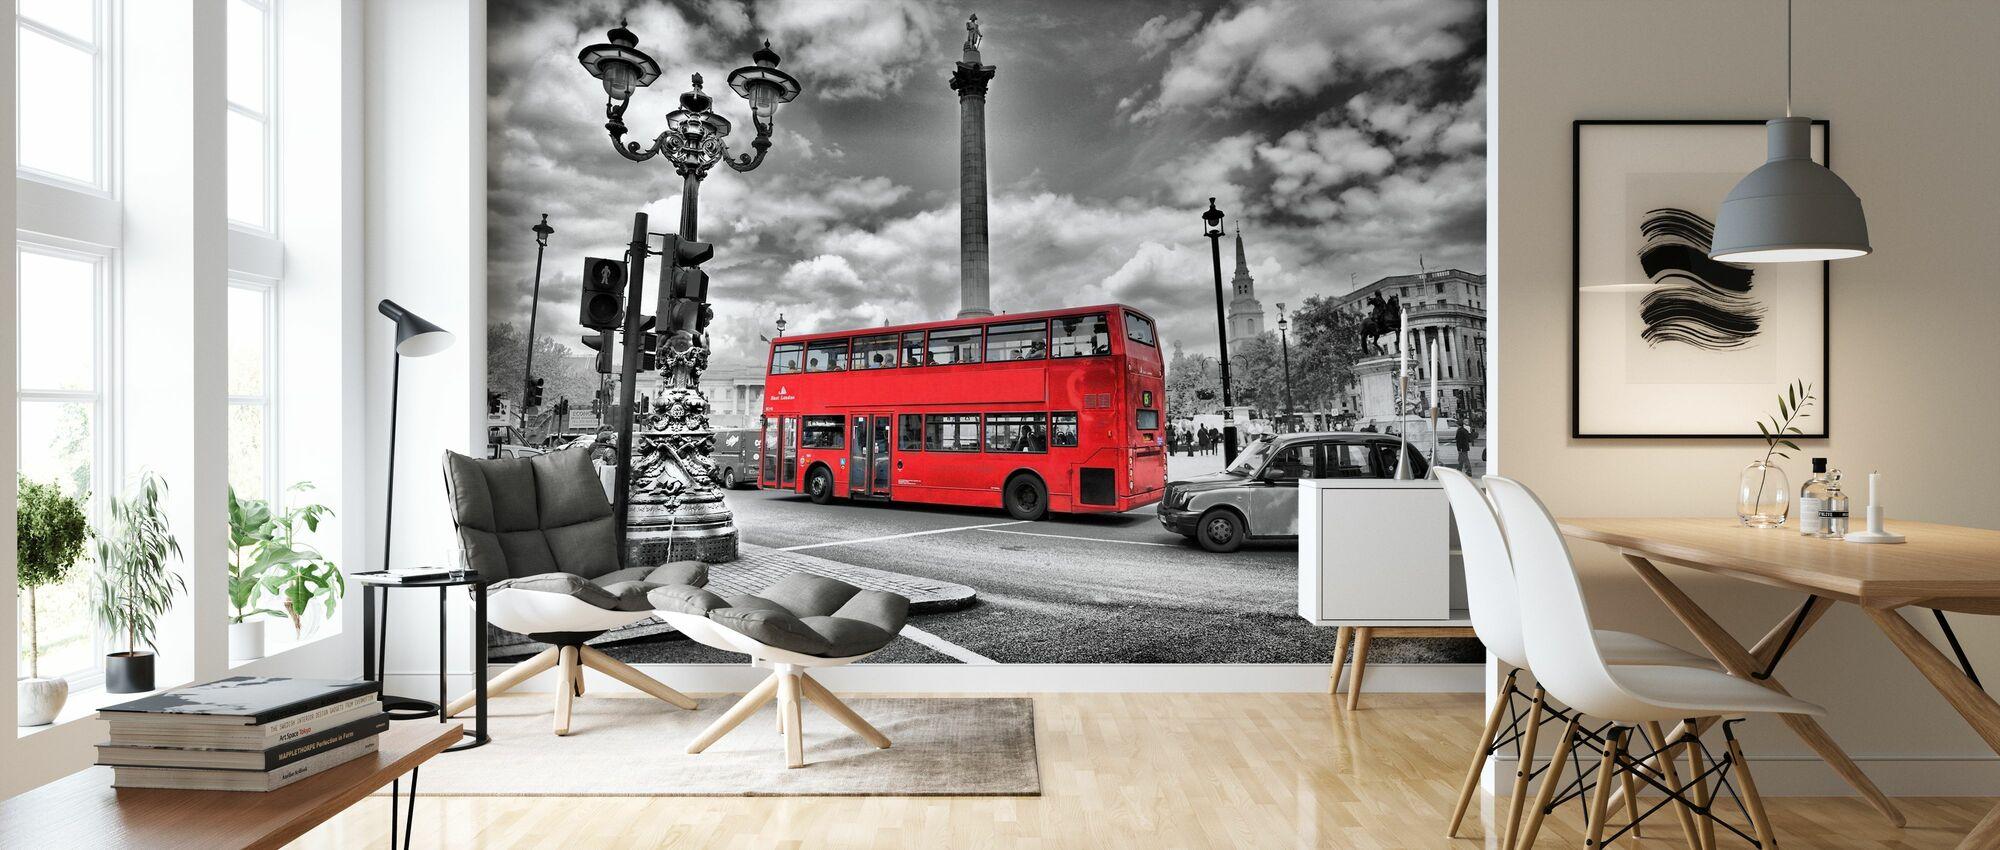 London buss - Colorsplash - Tapet - Stue